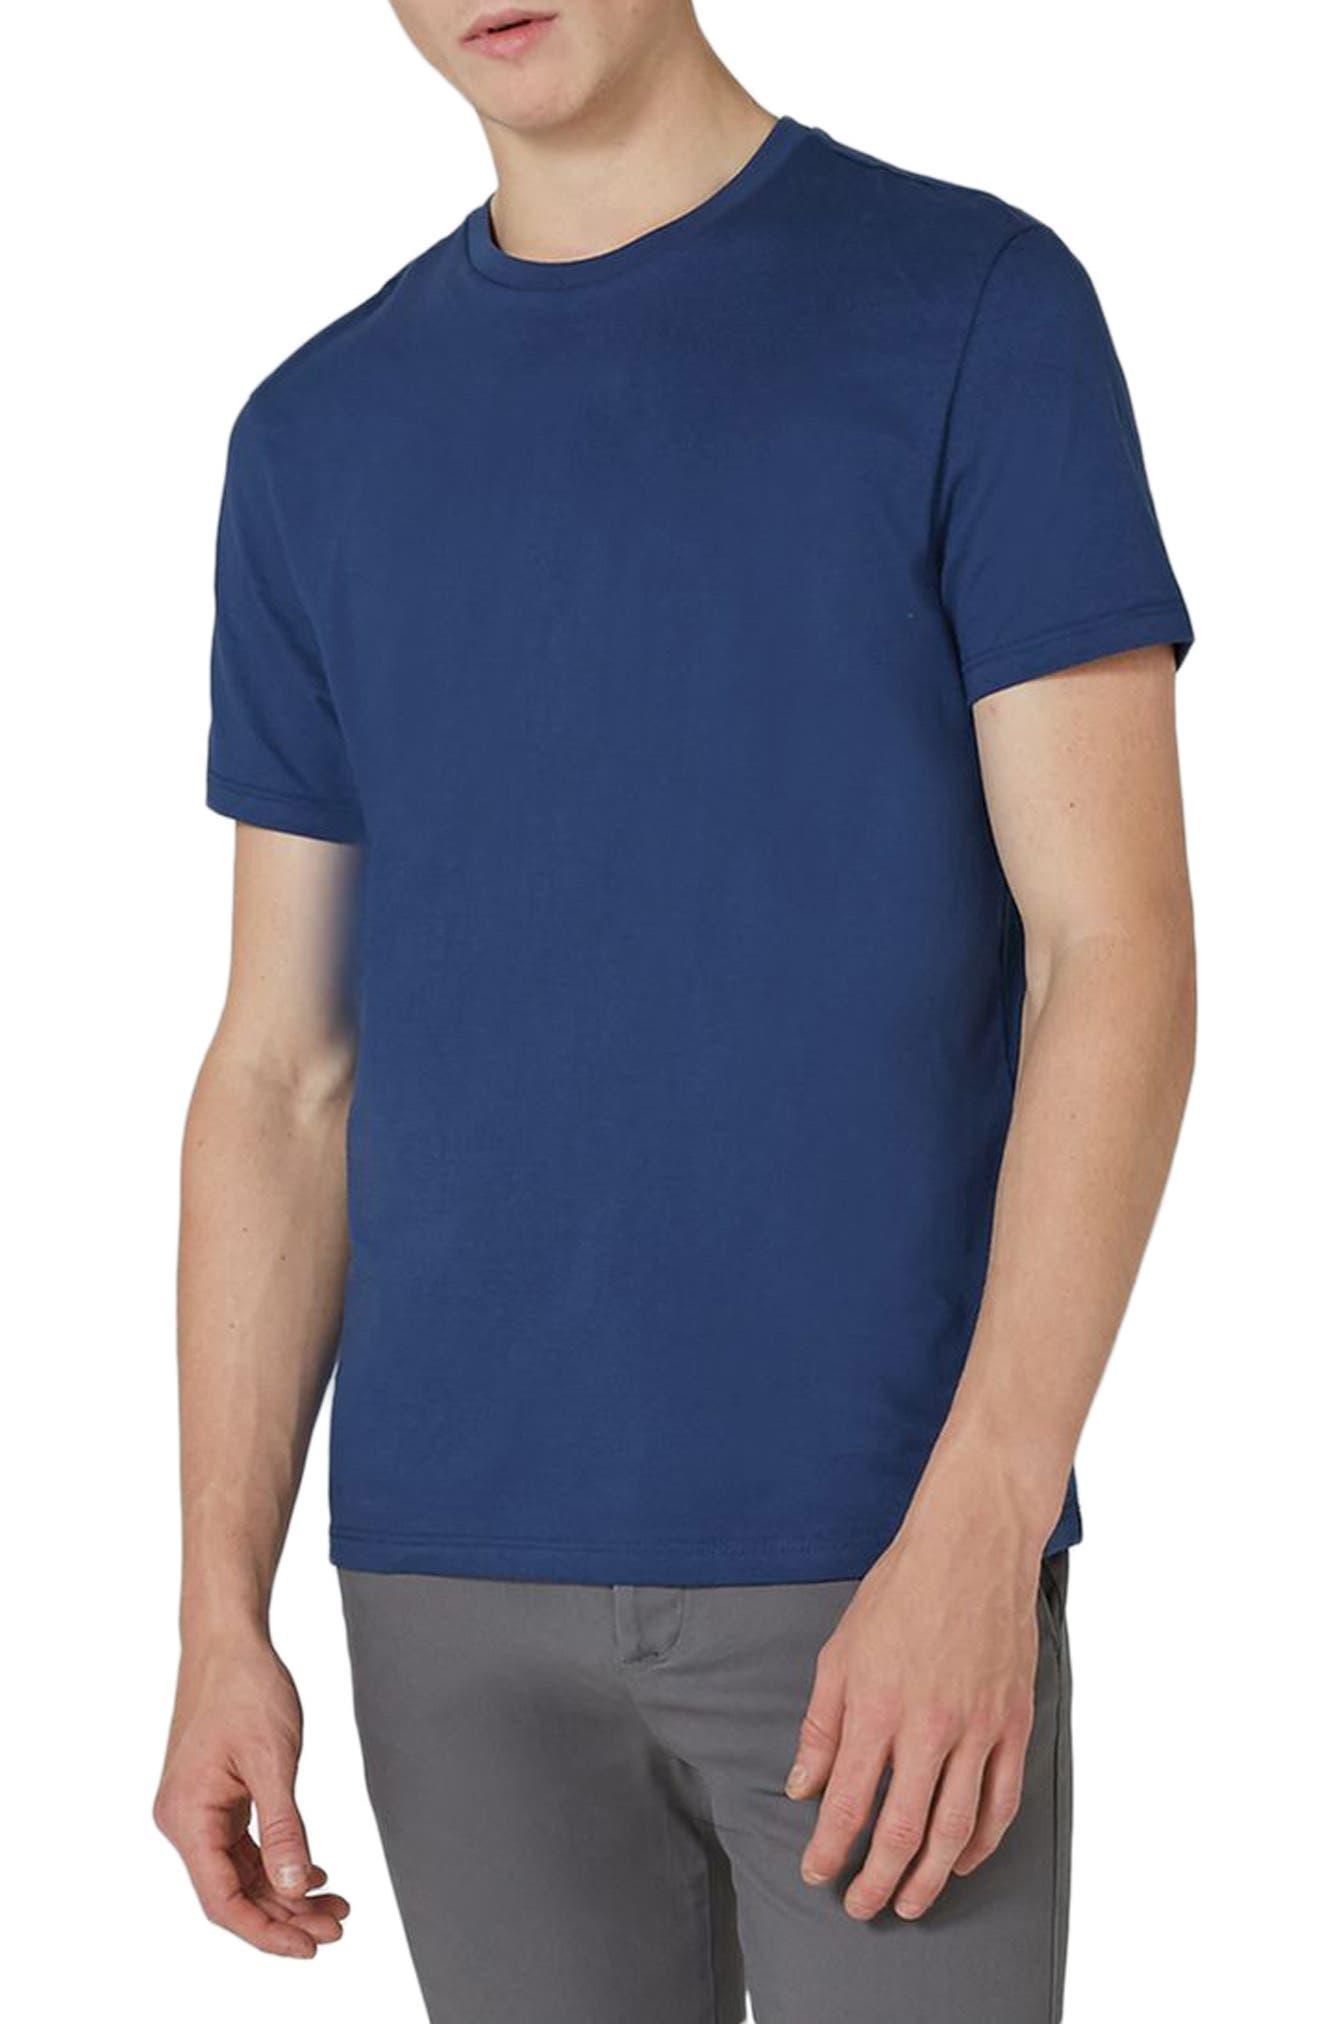 TOPMAN,                             Slim Fit Crewneck T-Shirt,                             Main thumbnail 1, color,                             450